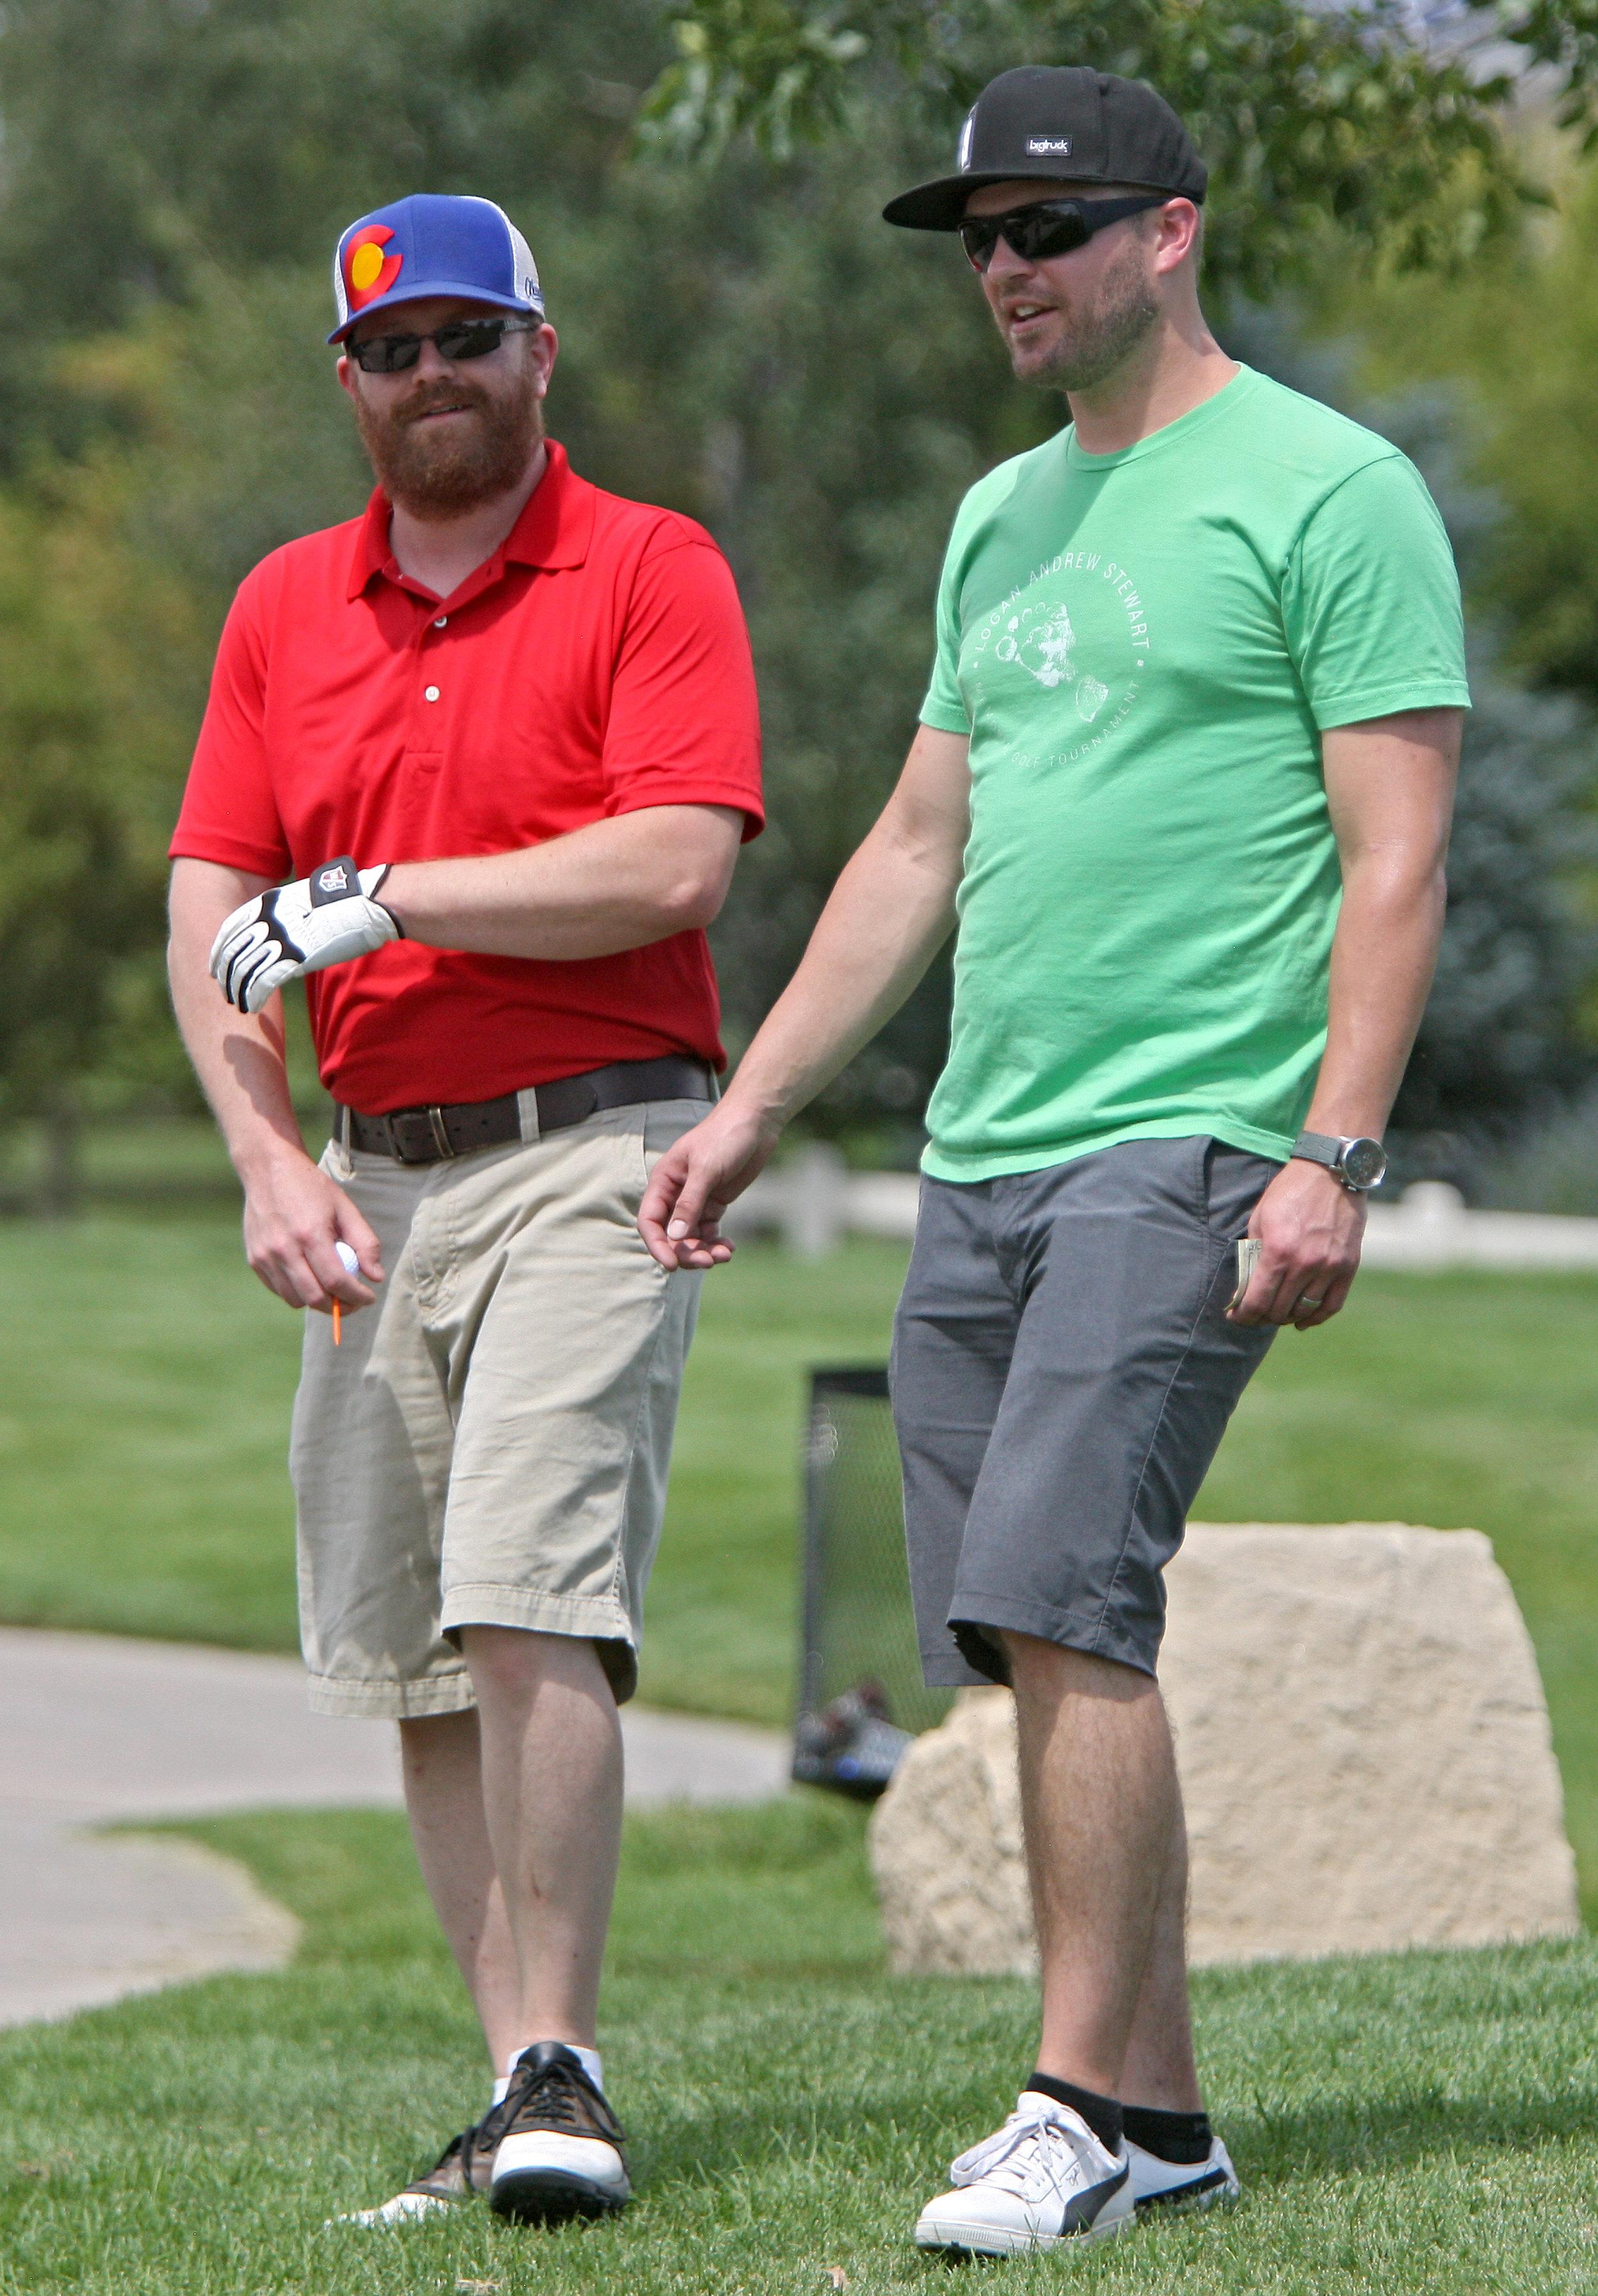 2017_Walk_With_Me_Golf_0011.JPG